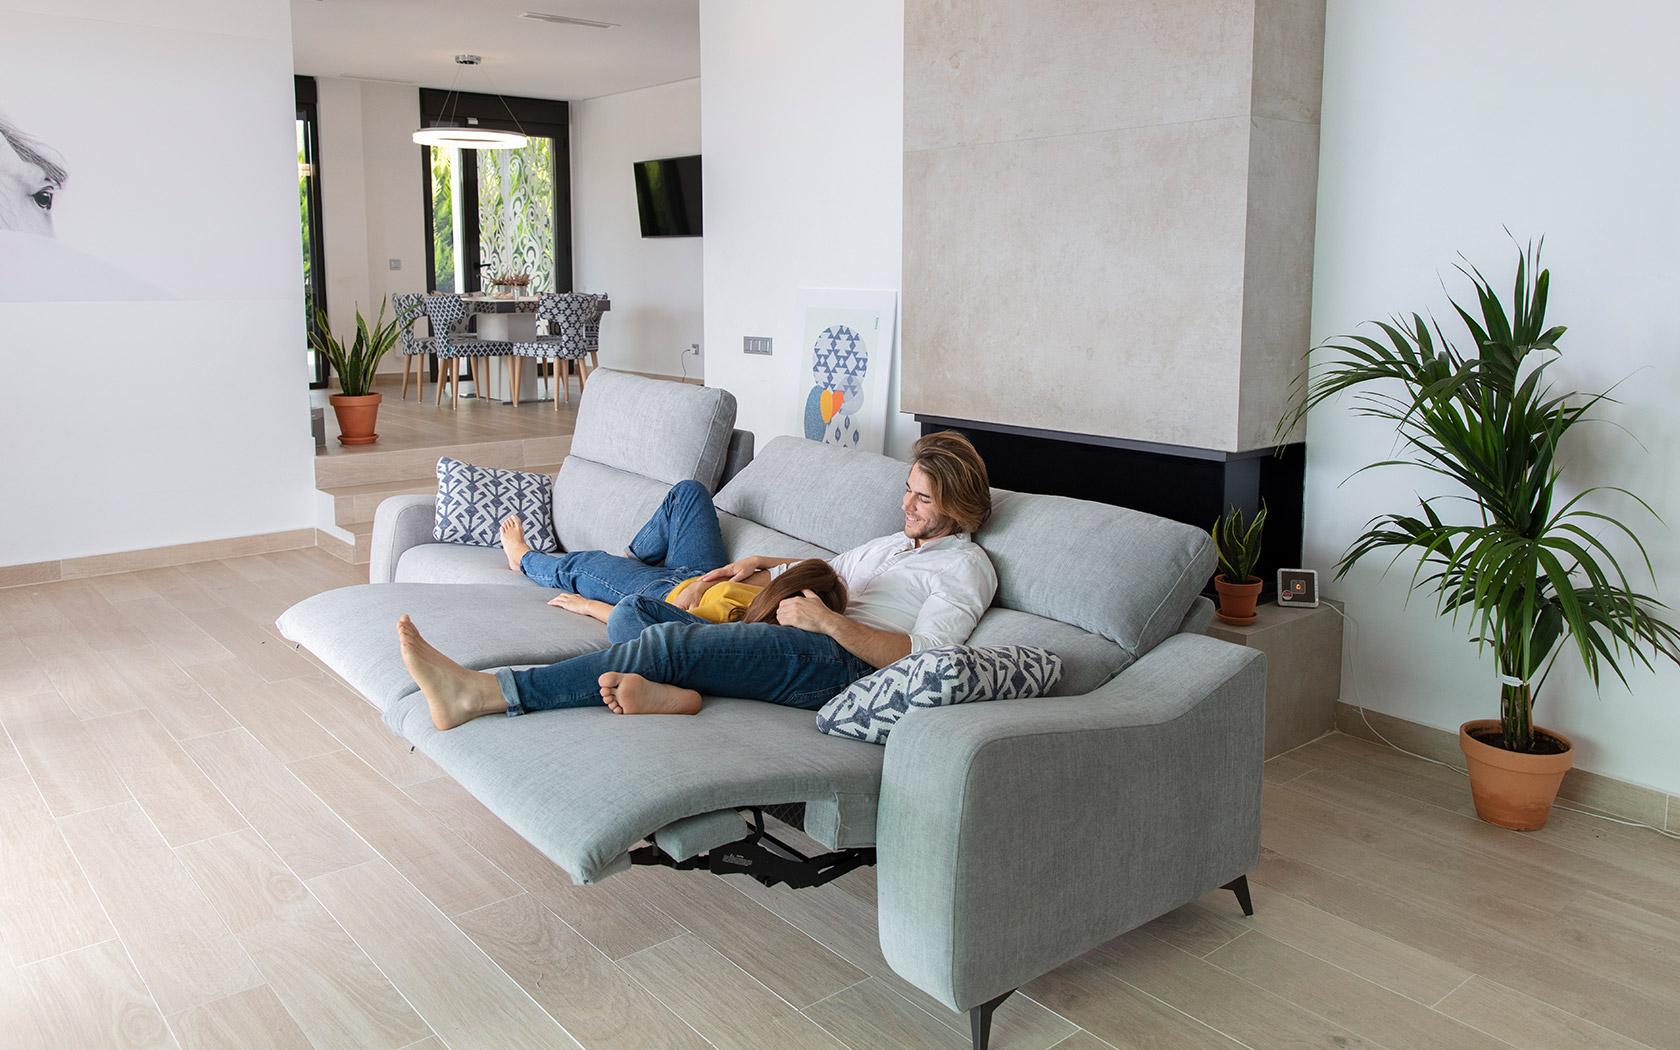 axel sofa 2021 03